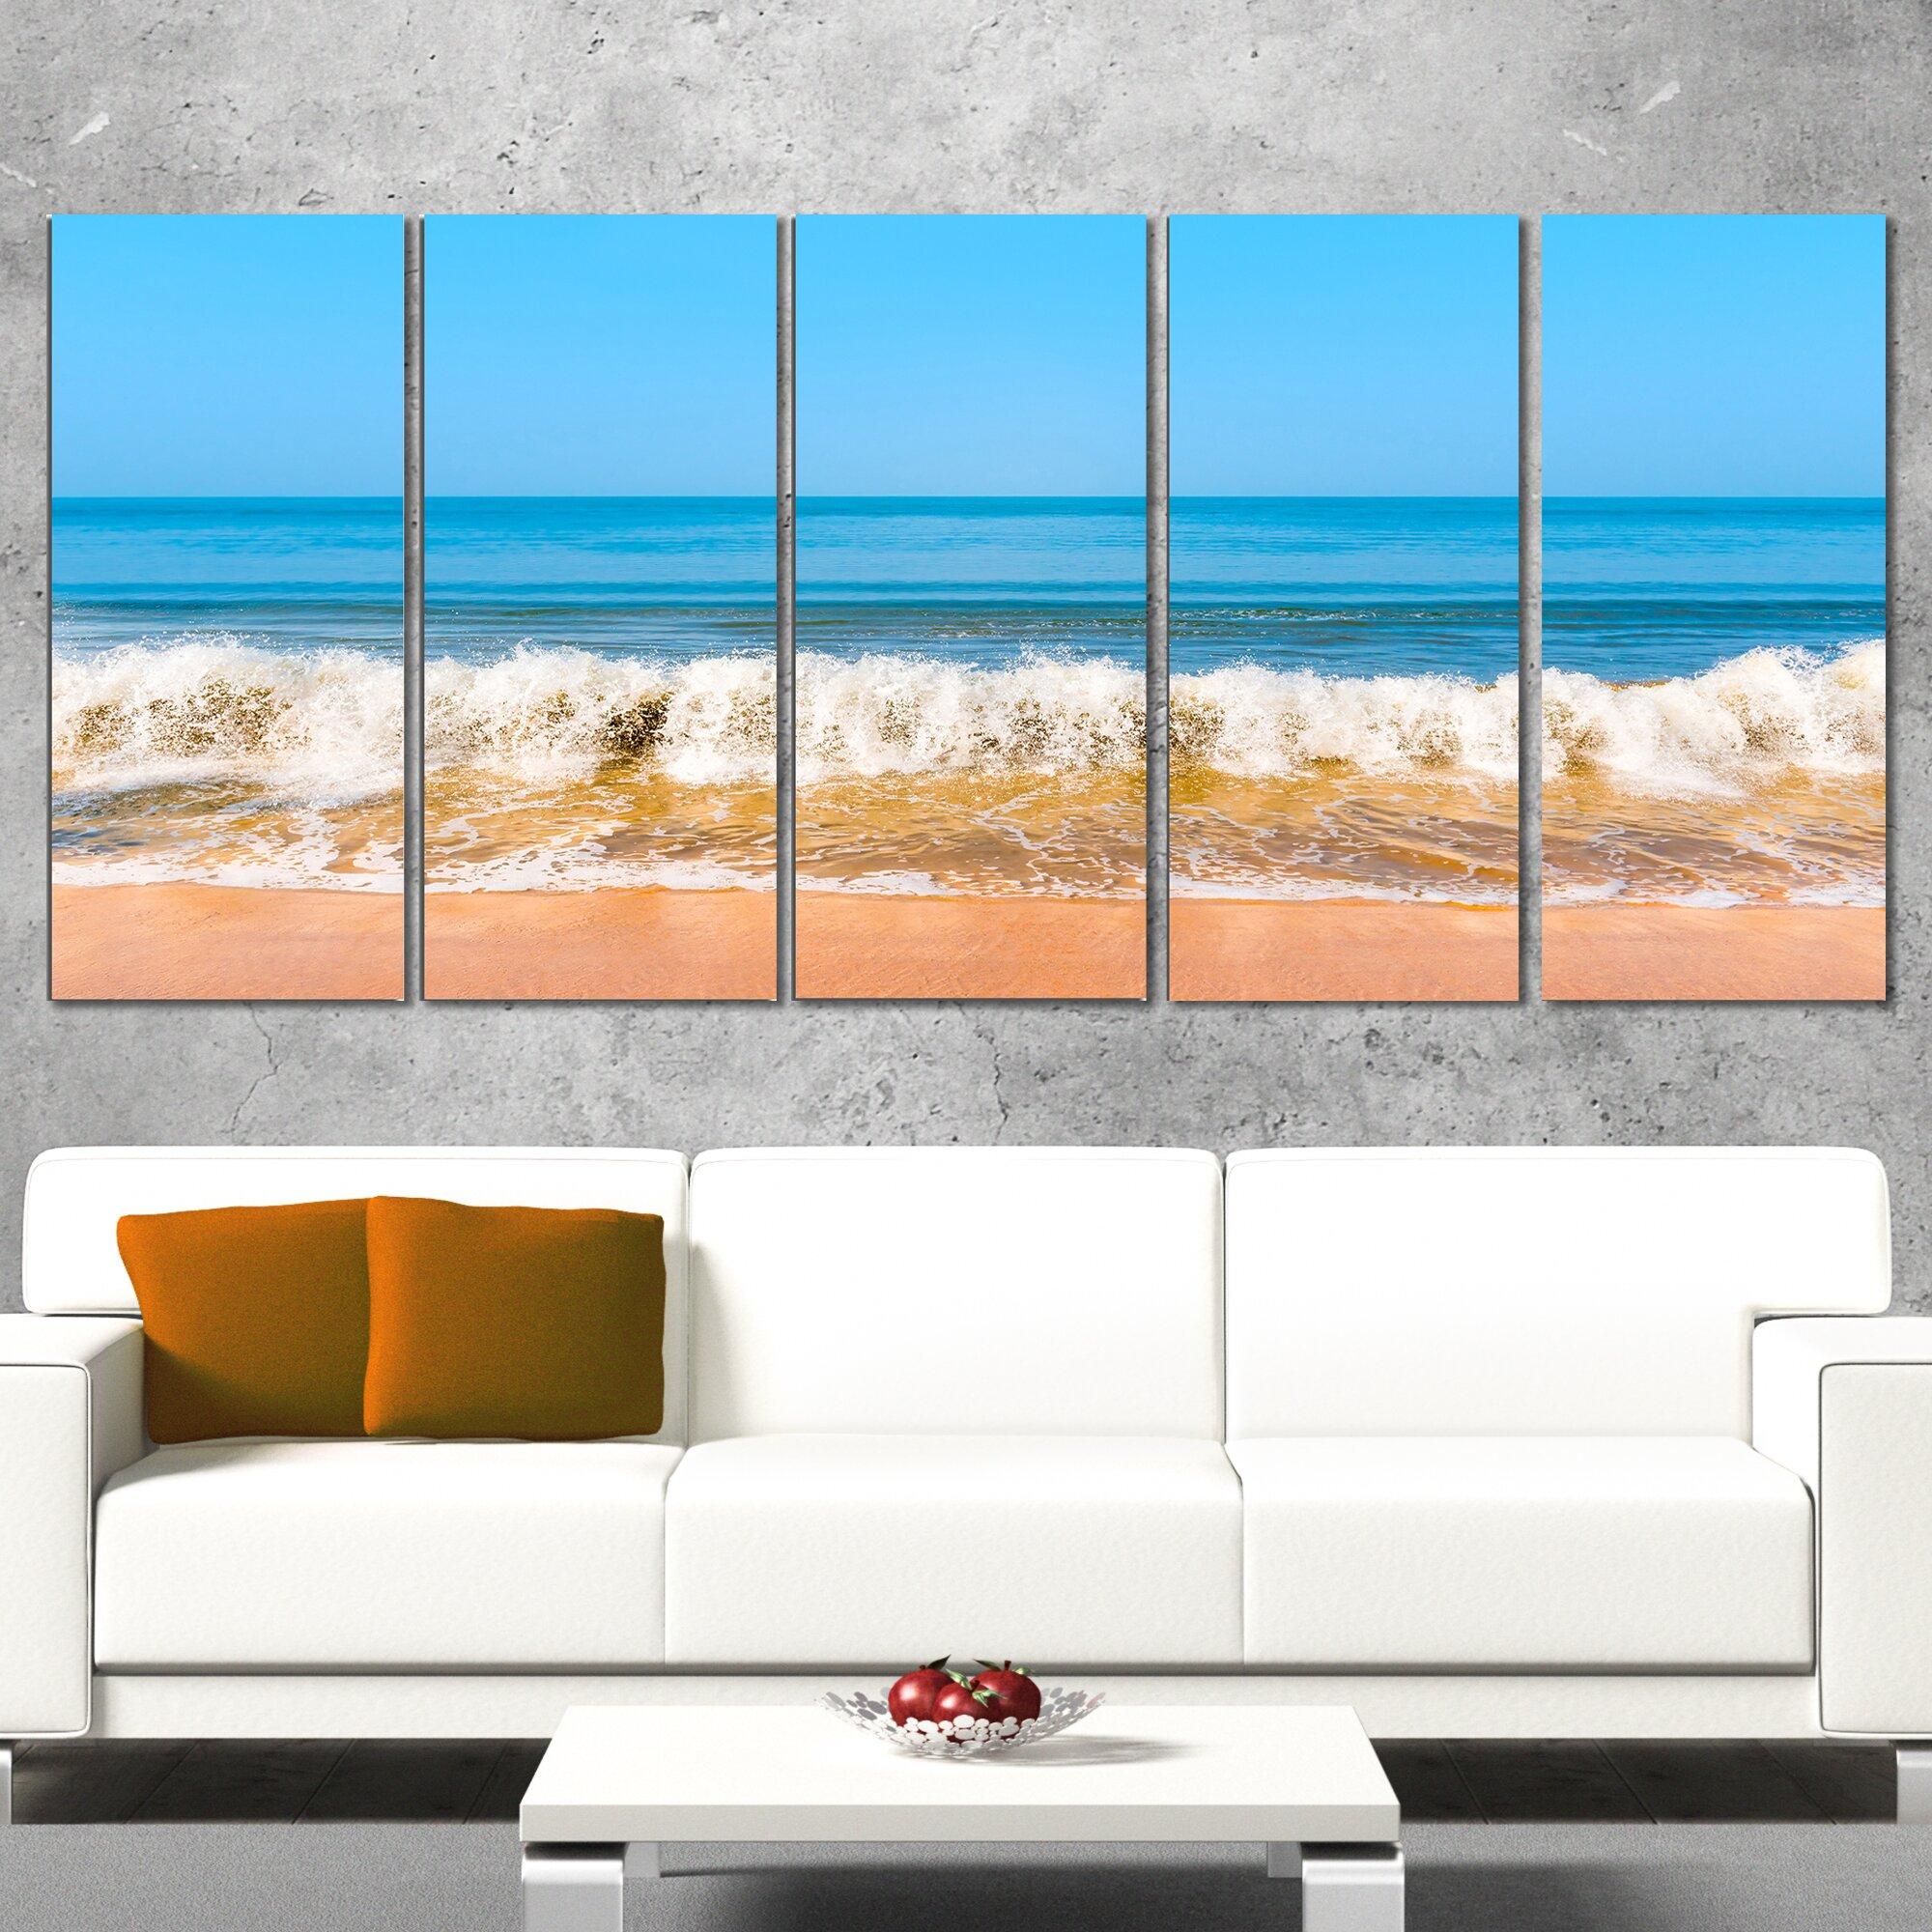 designart beautiful blue sea and roaring waves 5 piece wall art on wrapped canvas set wayfair. Black Bedroom Furniture Sets. Home Design Ideas